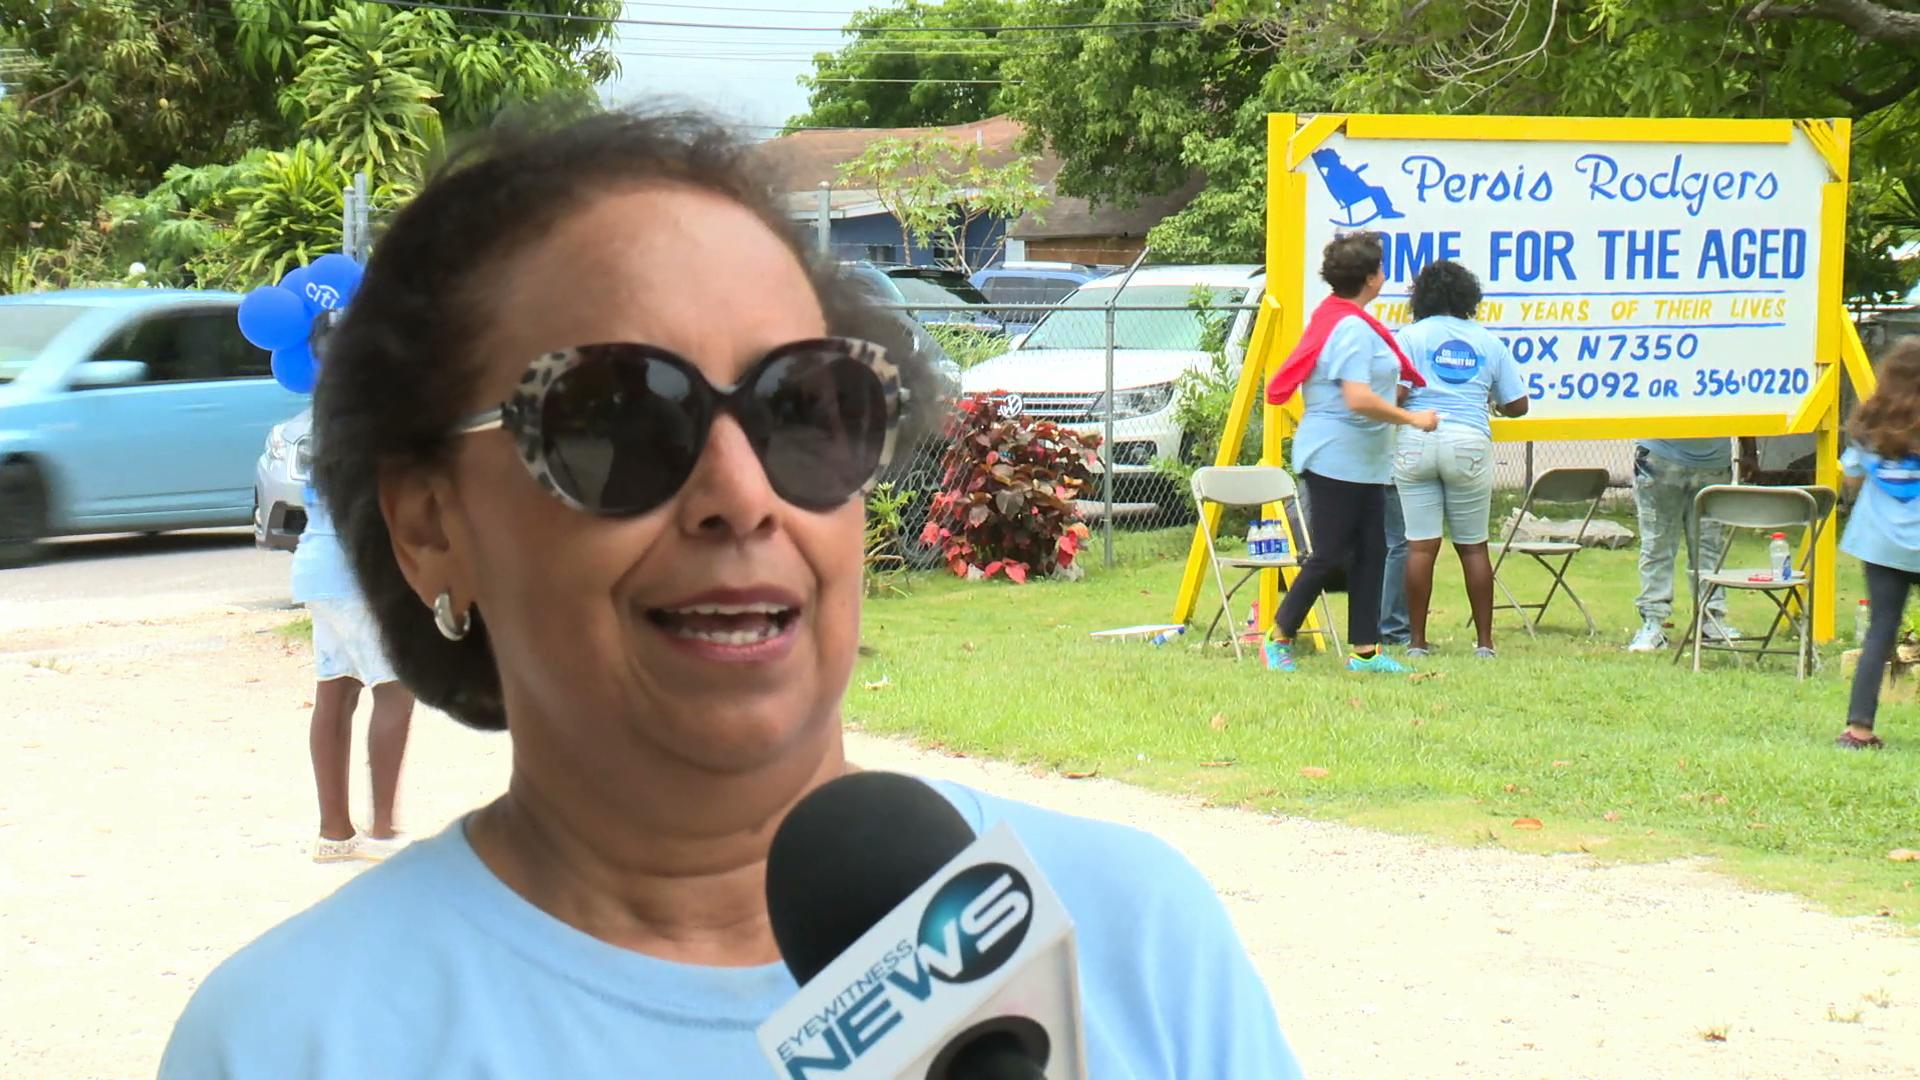 Citi Bank Bahamas helps the aged